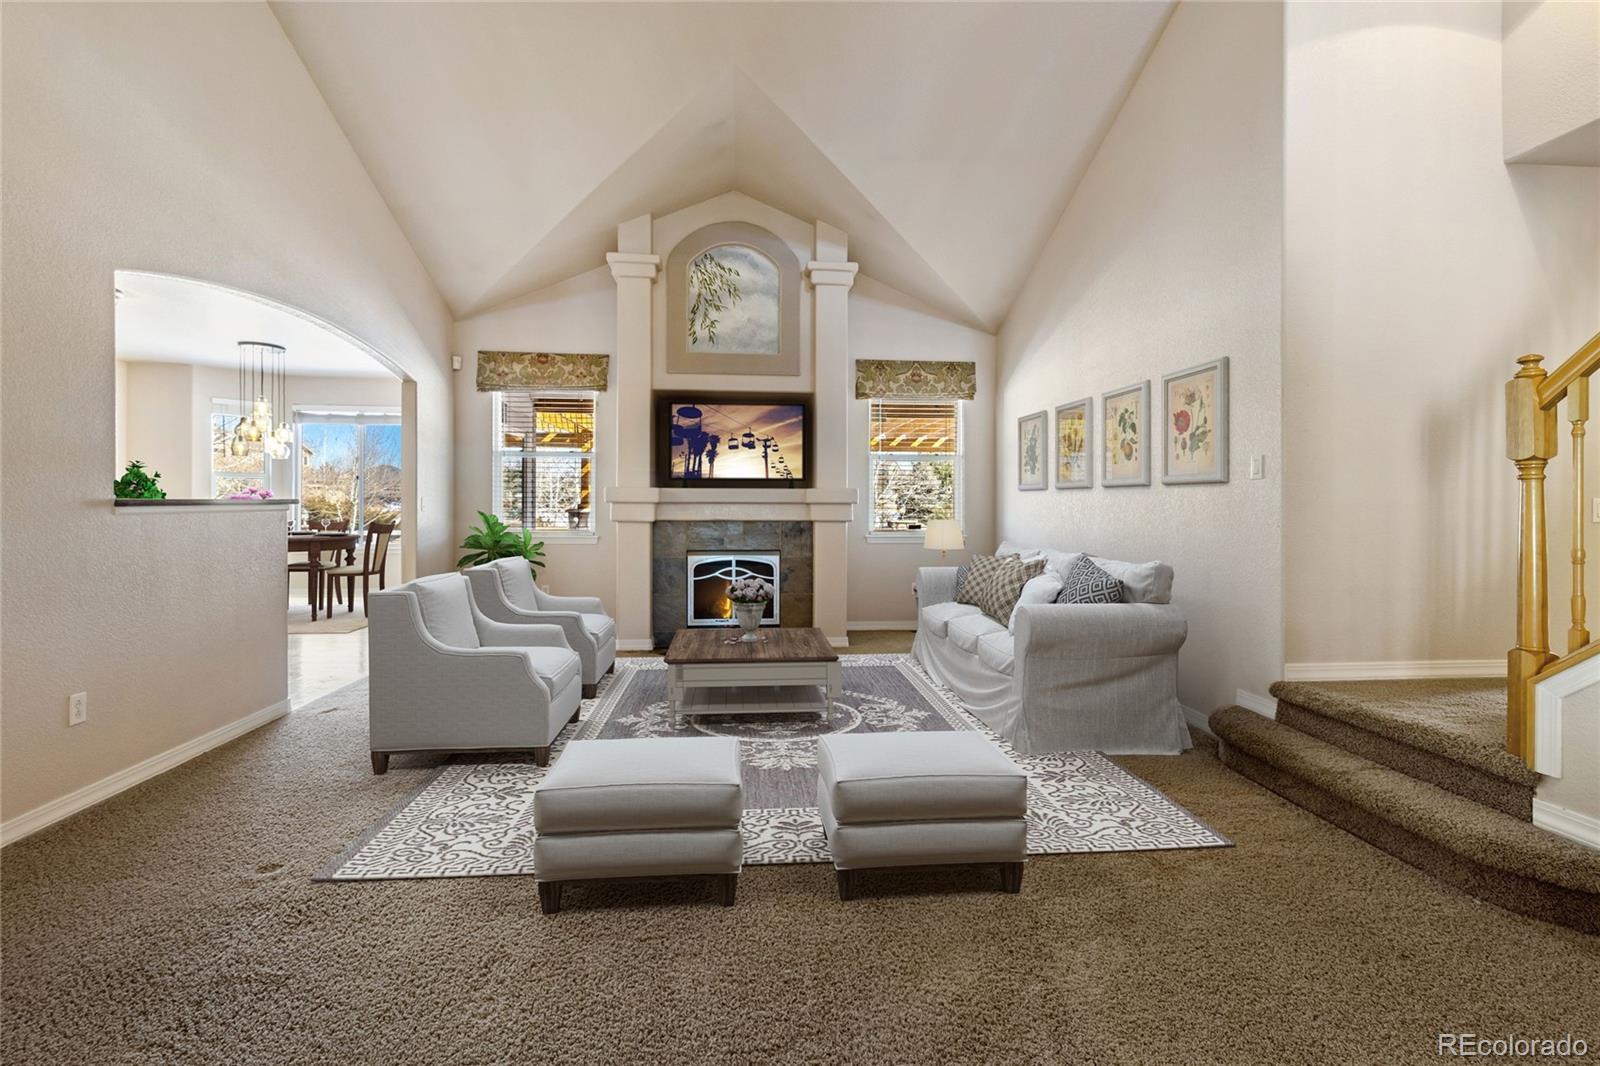 Living room w fireplace